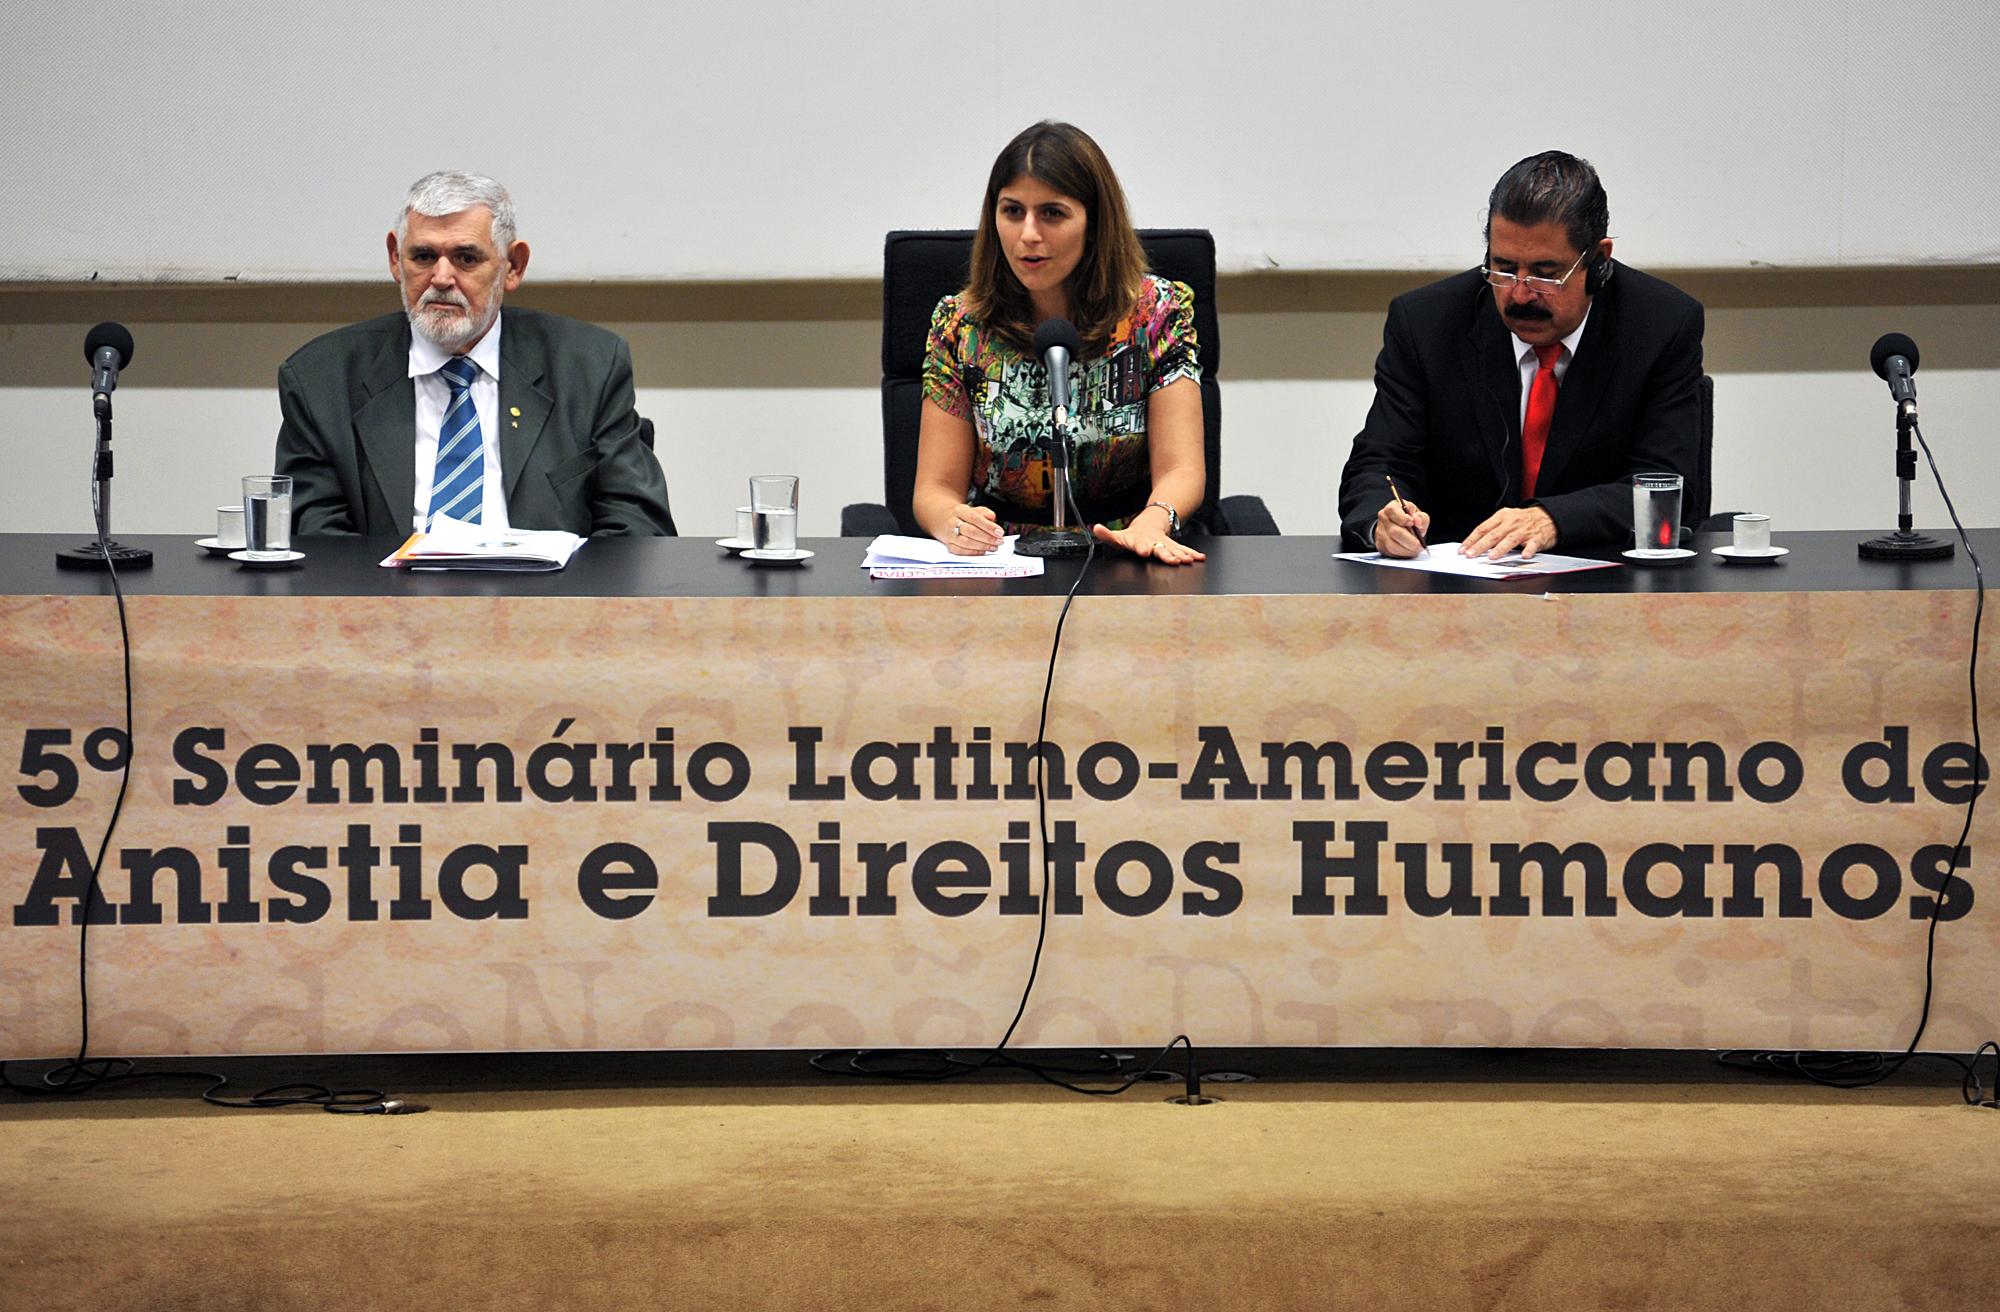 http://www.camara.gov.br/internet/bancoimagem/banco/20111018112543_20111018_004BO_DA.jpg